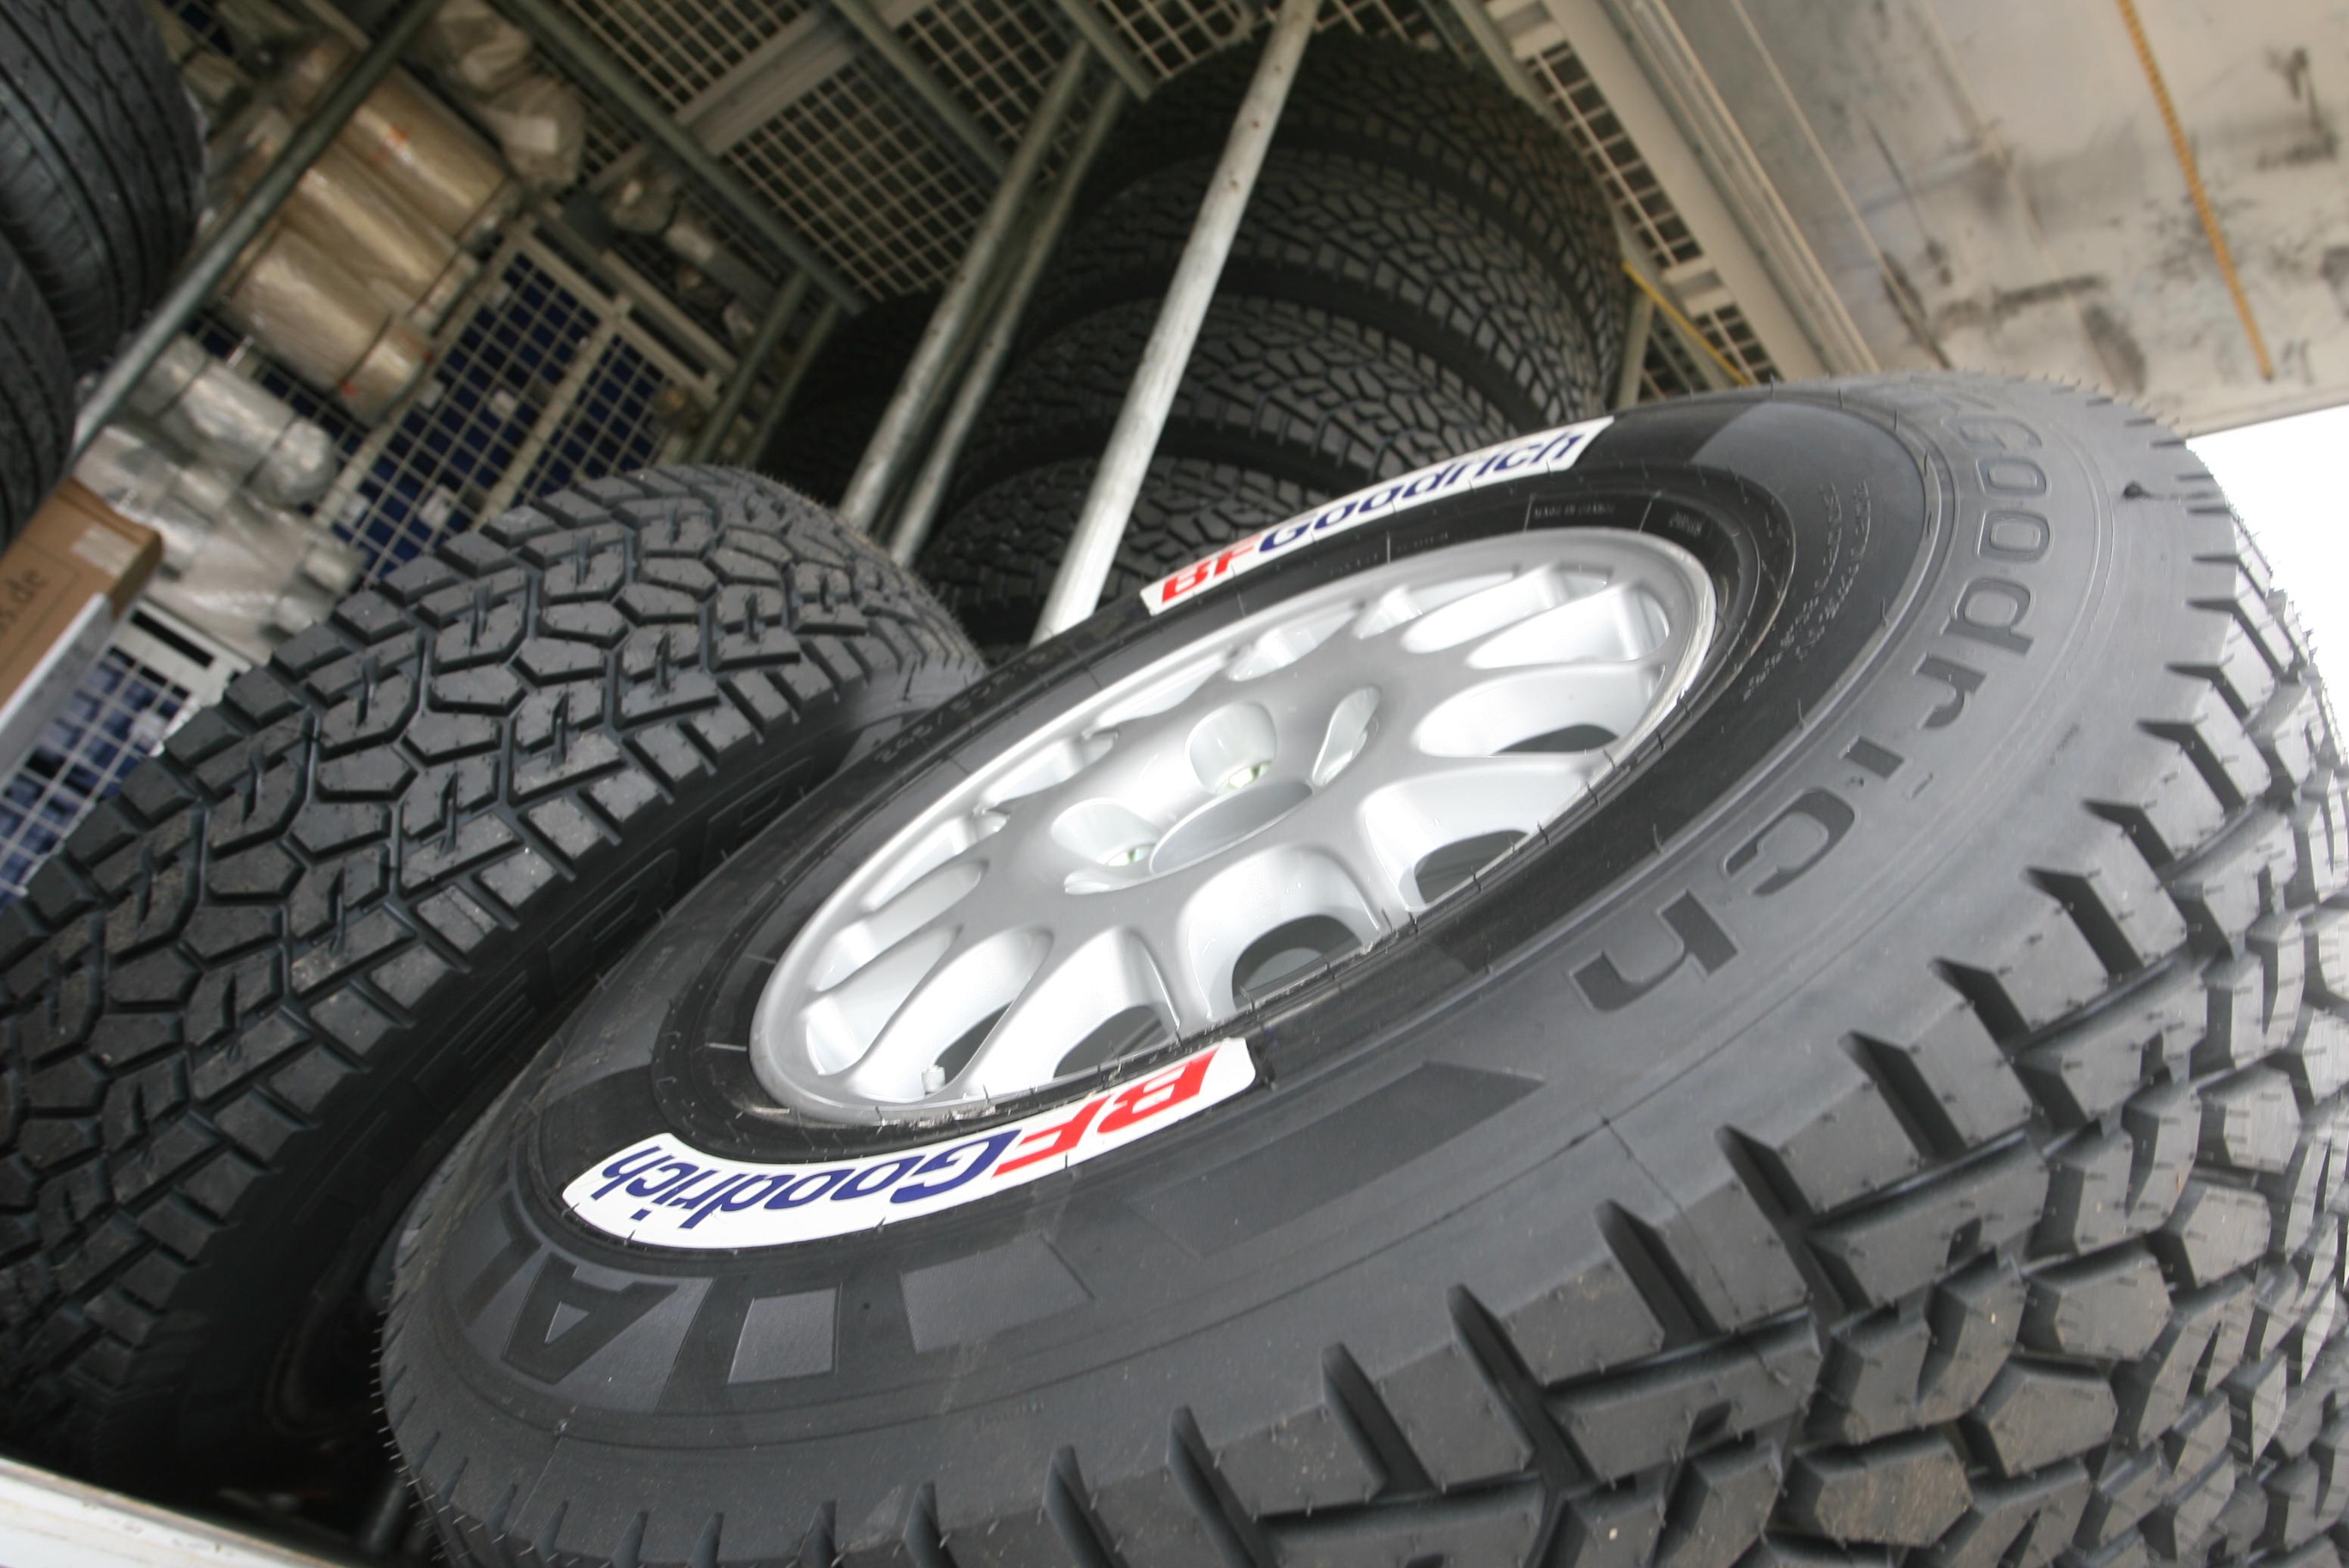 bfgoodrich tires highlights 2013 contingency and driver. Black Bedroom Furniture Sets. Home Design Ideas